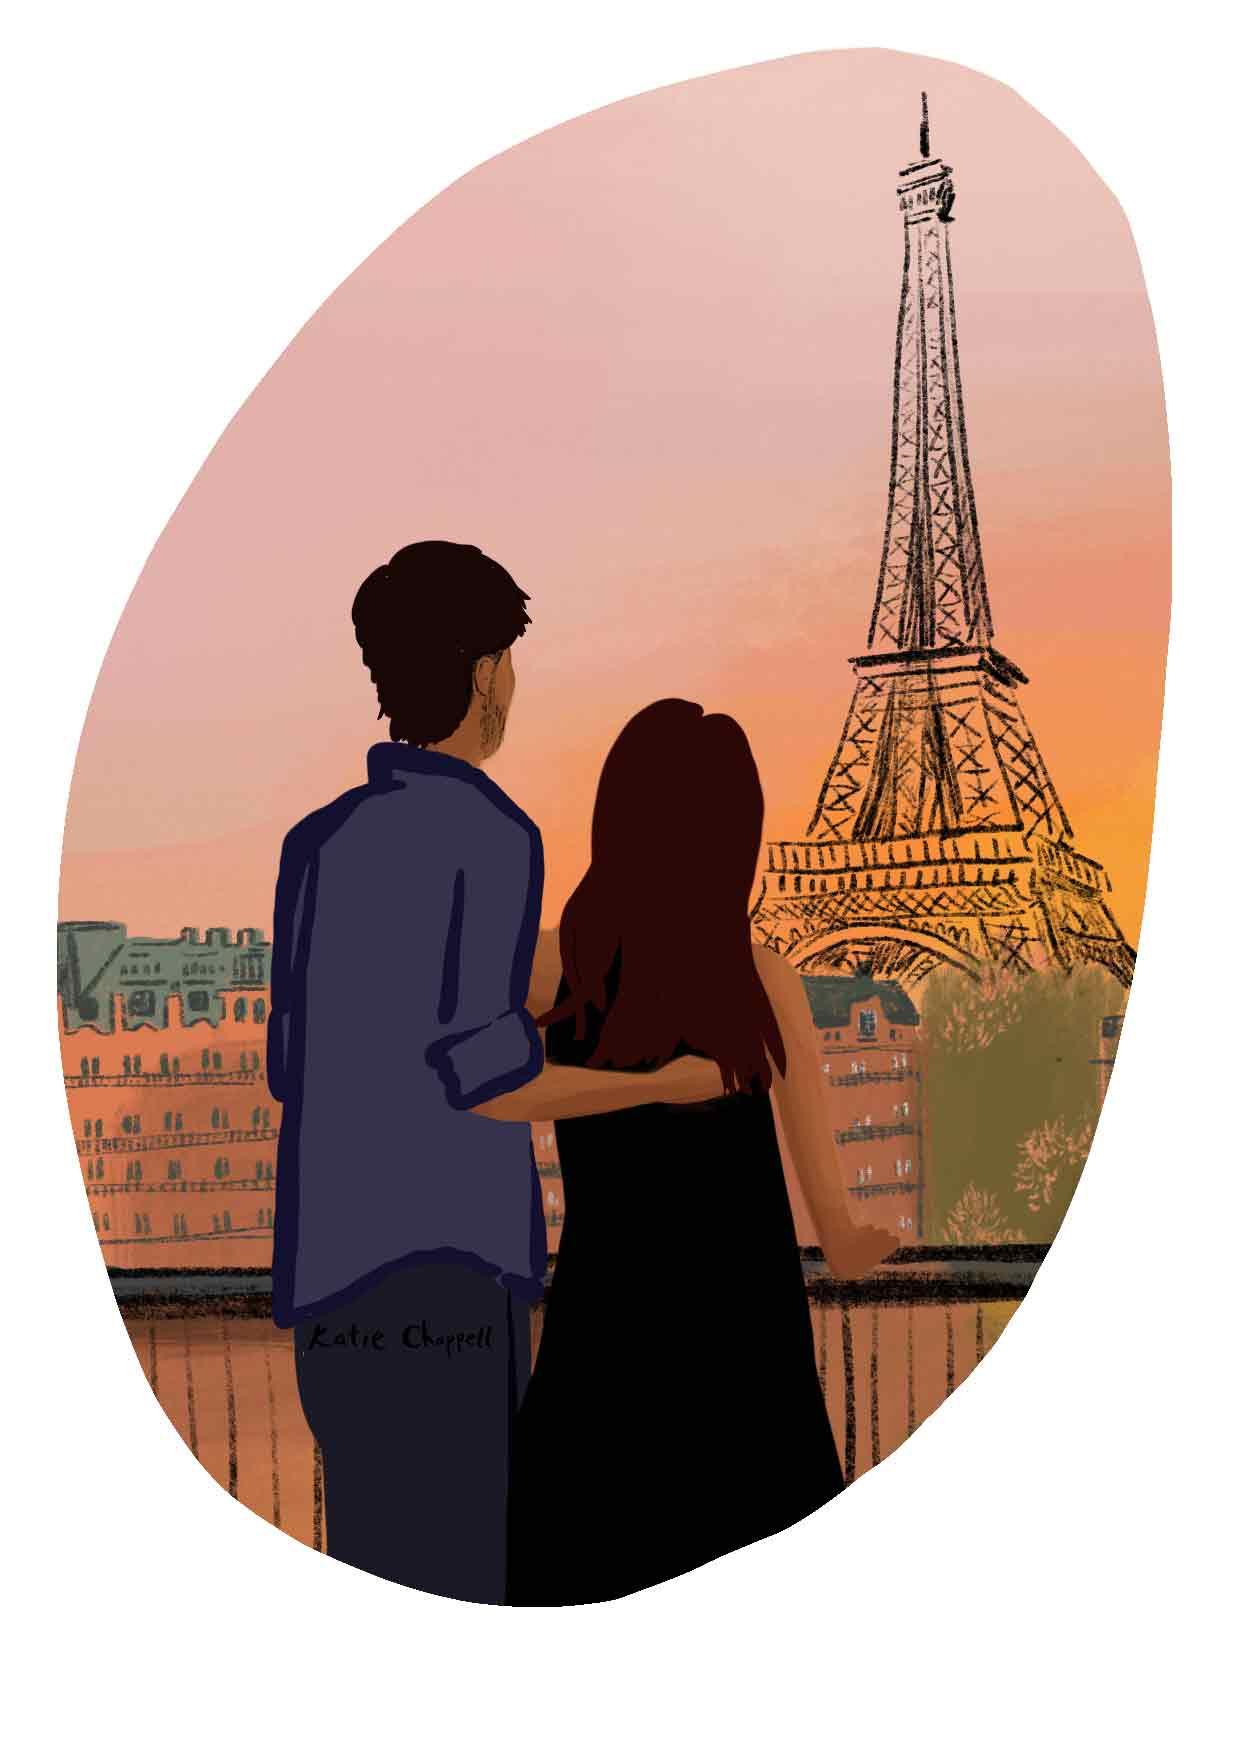 Paris-illustration-edinburgh-katie-chappell.jpg